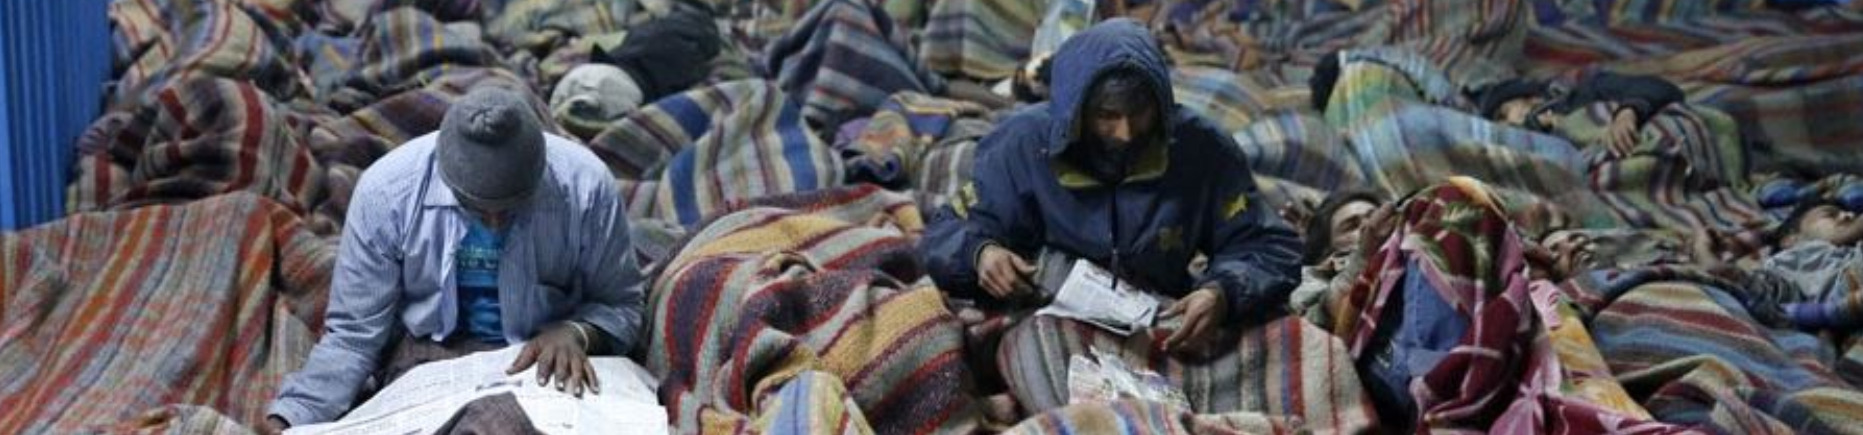 "CAA-NPR-NRC ""Dangerous Proposition"" For Urban Poor: NCU"